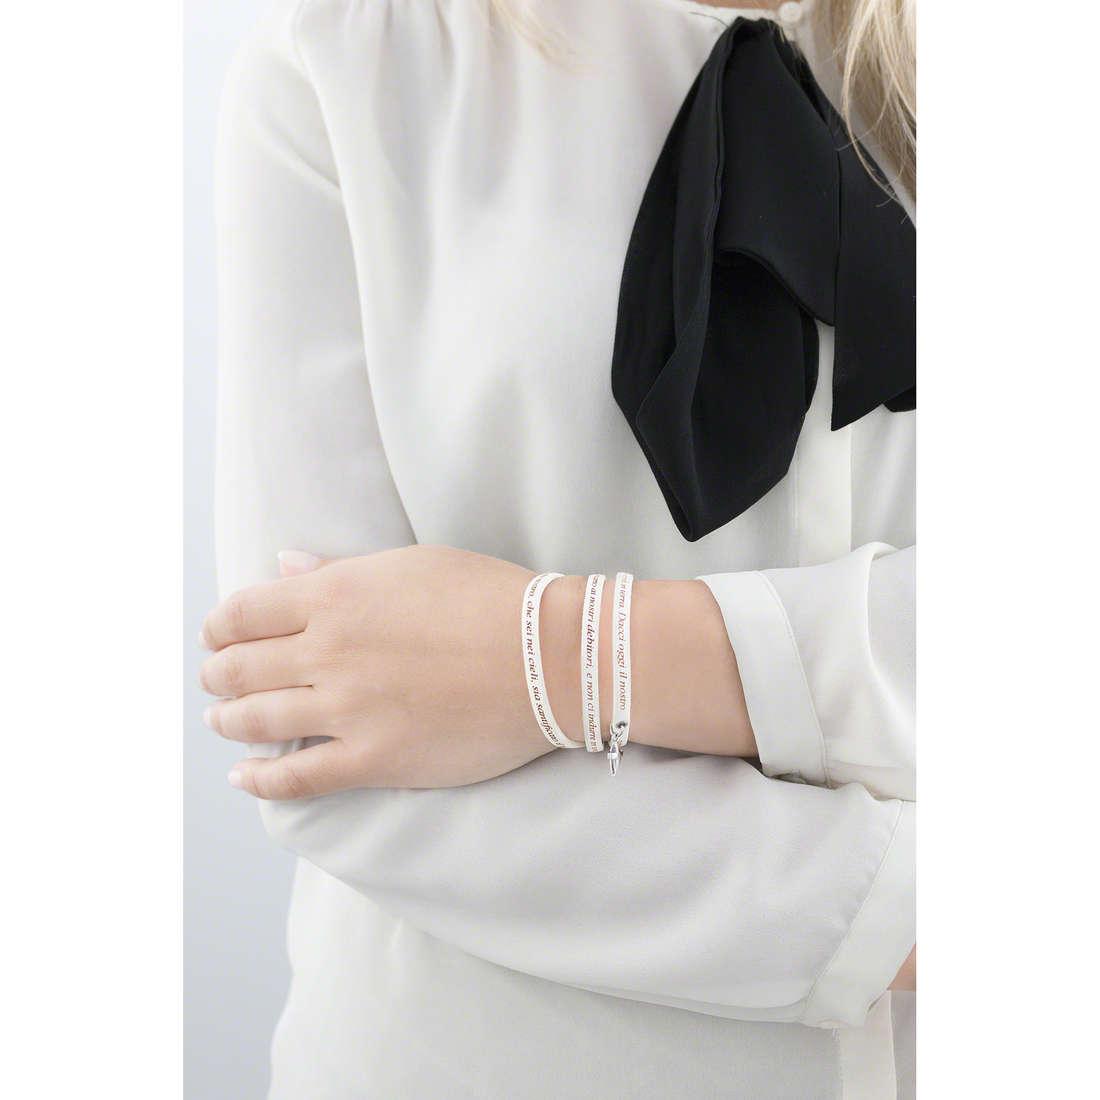 Amen bracelets Padre Nostro Italiano femme AC-PNIT07-C-57 indosso